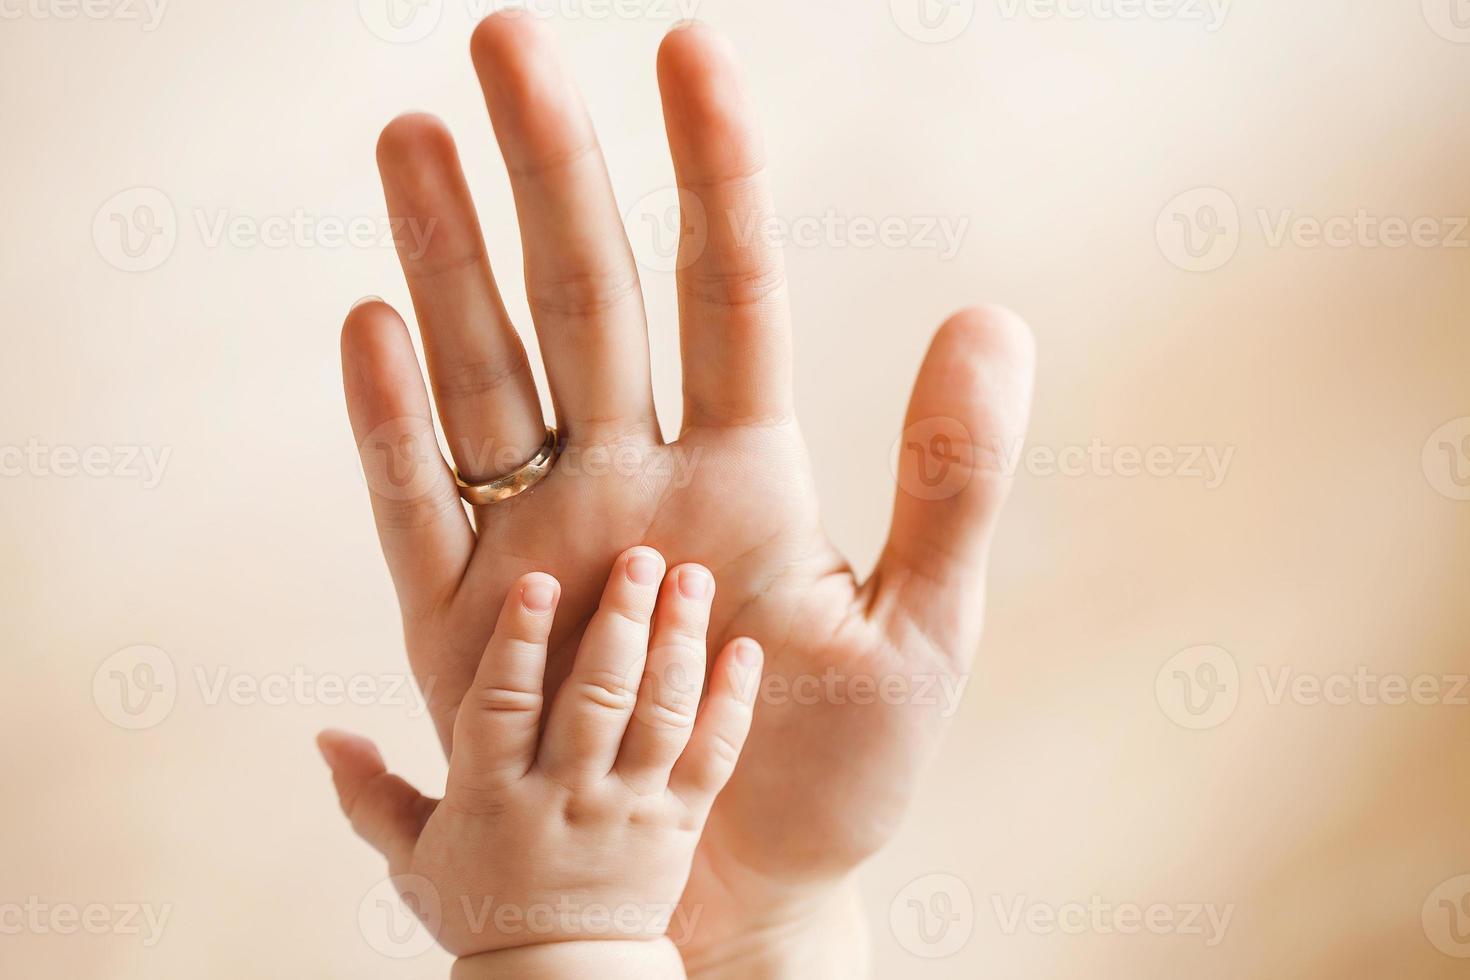 baby handflatan på hennes mammas handflata. foto